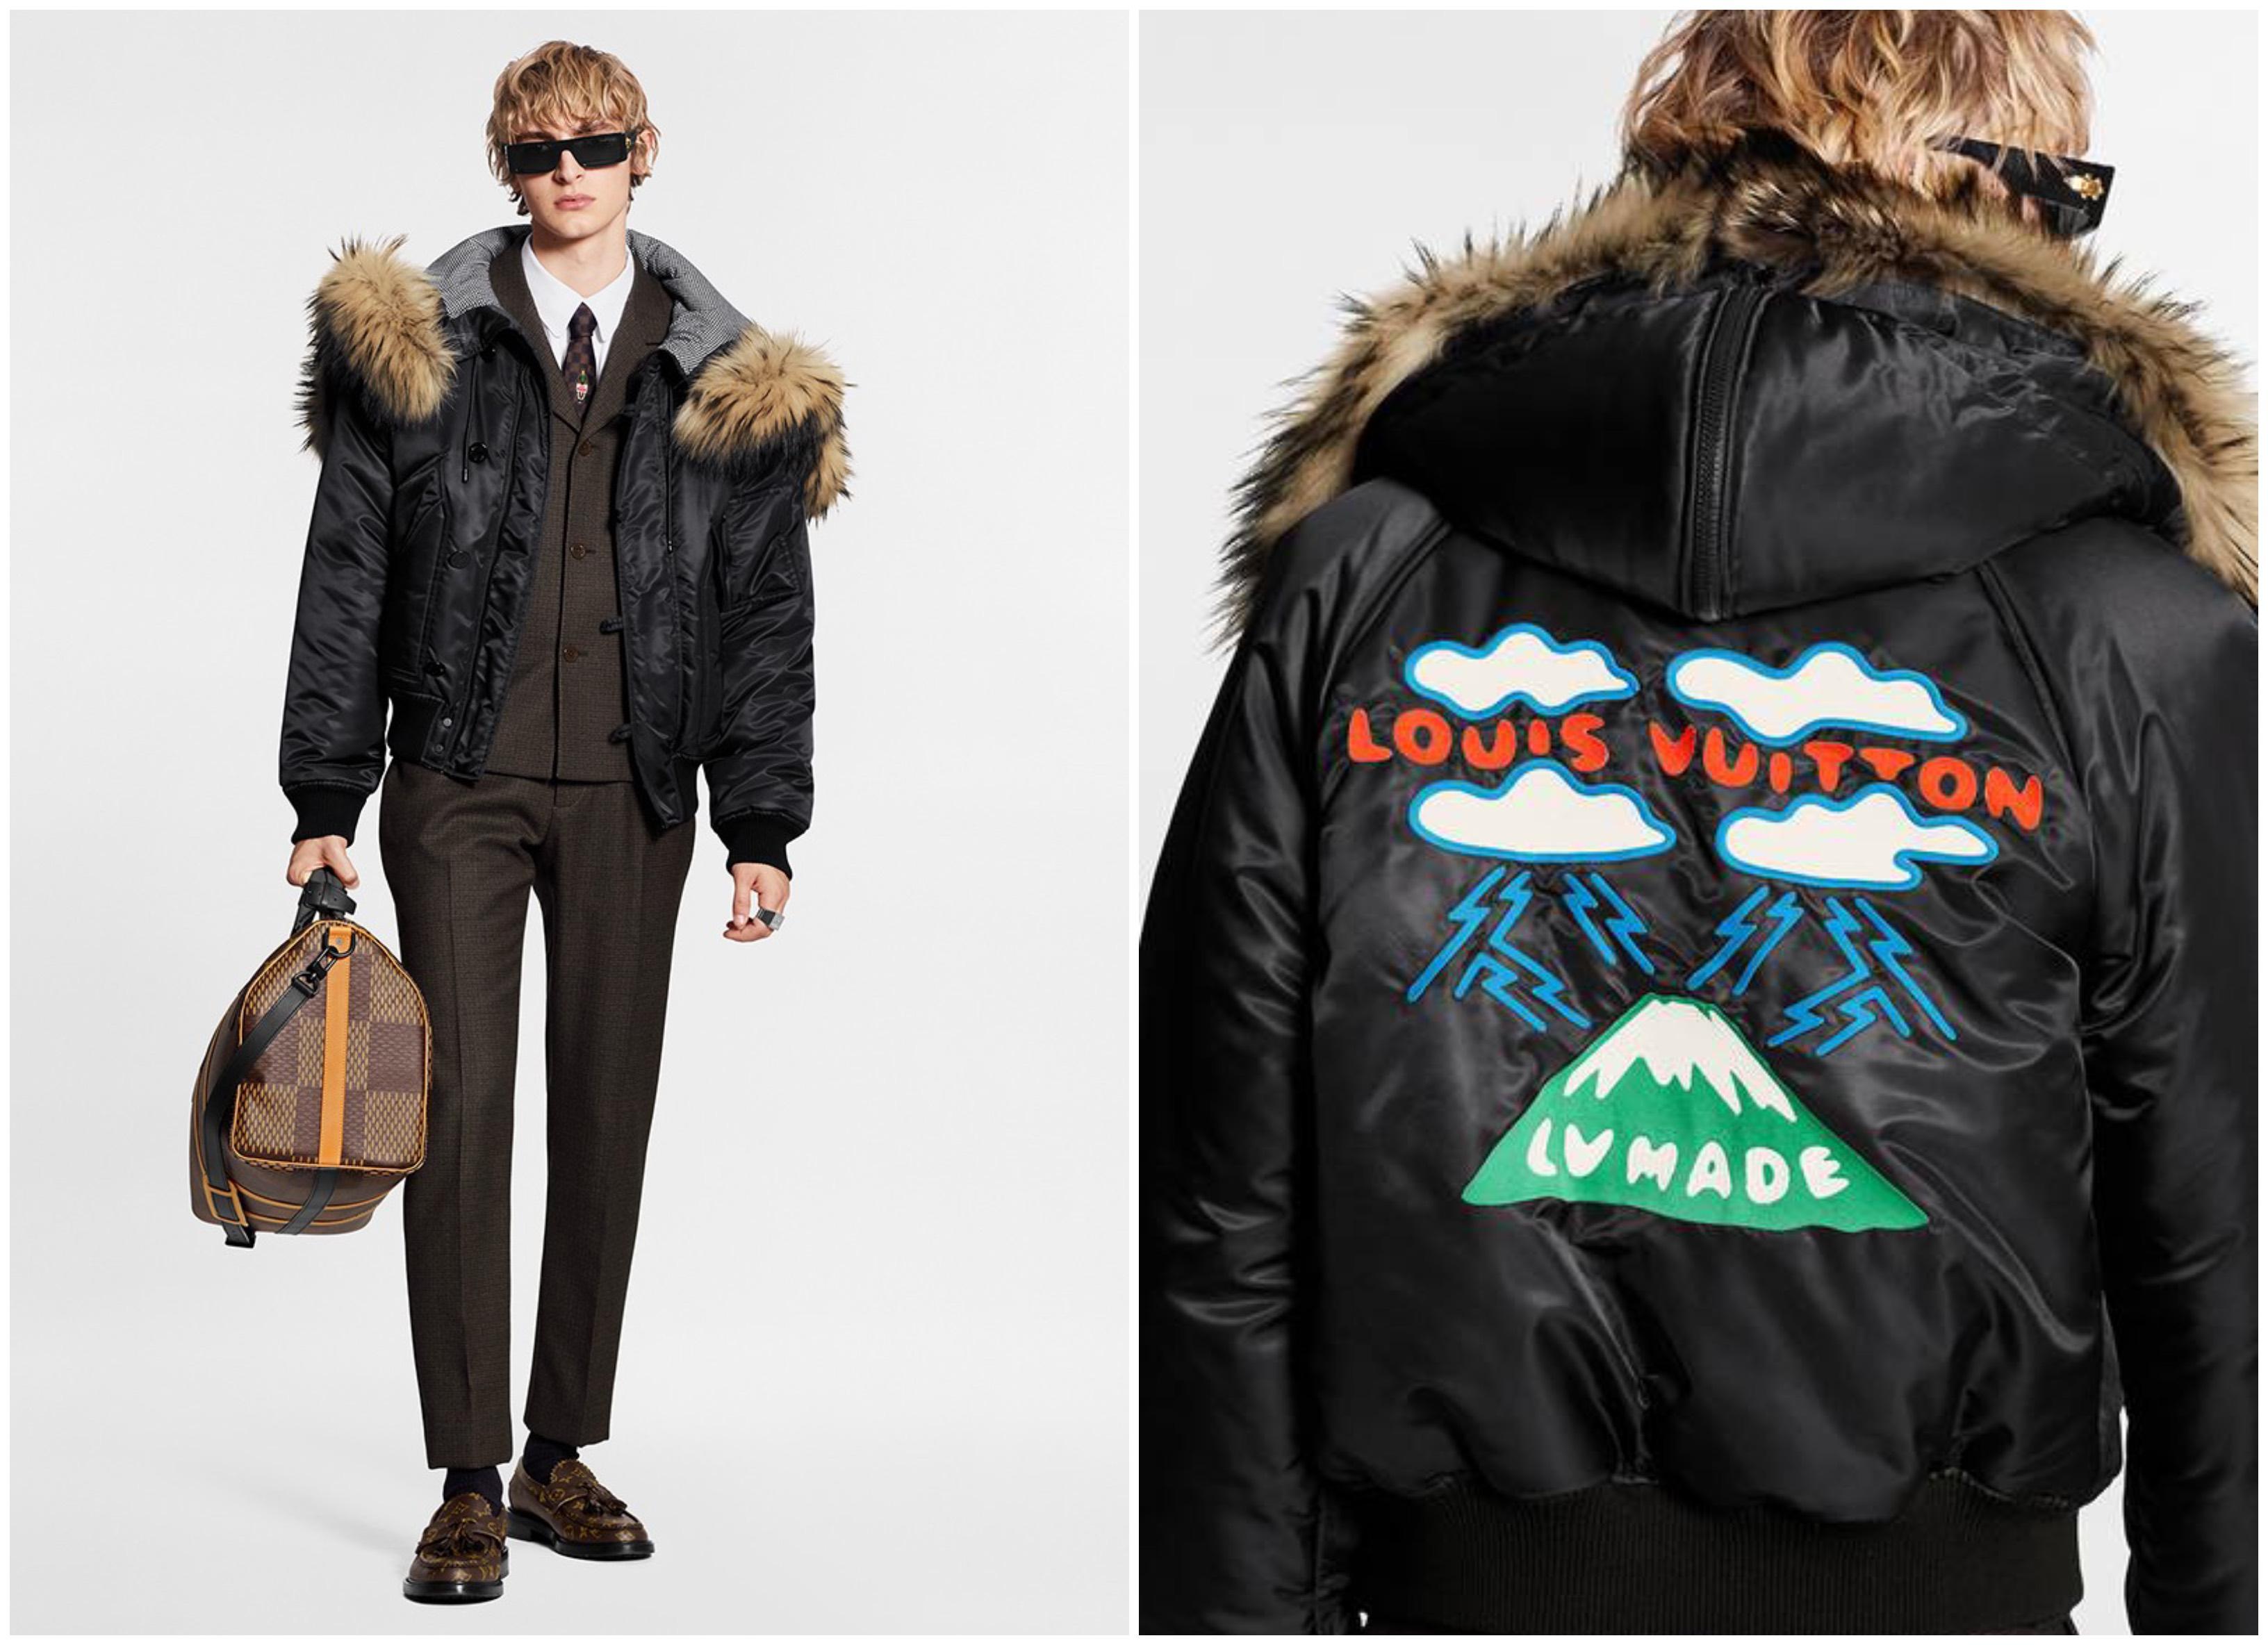 Louis Vuitton bst LV² áo khoác n-2b